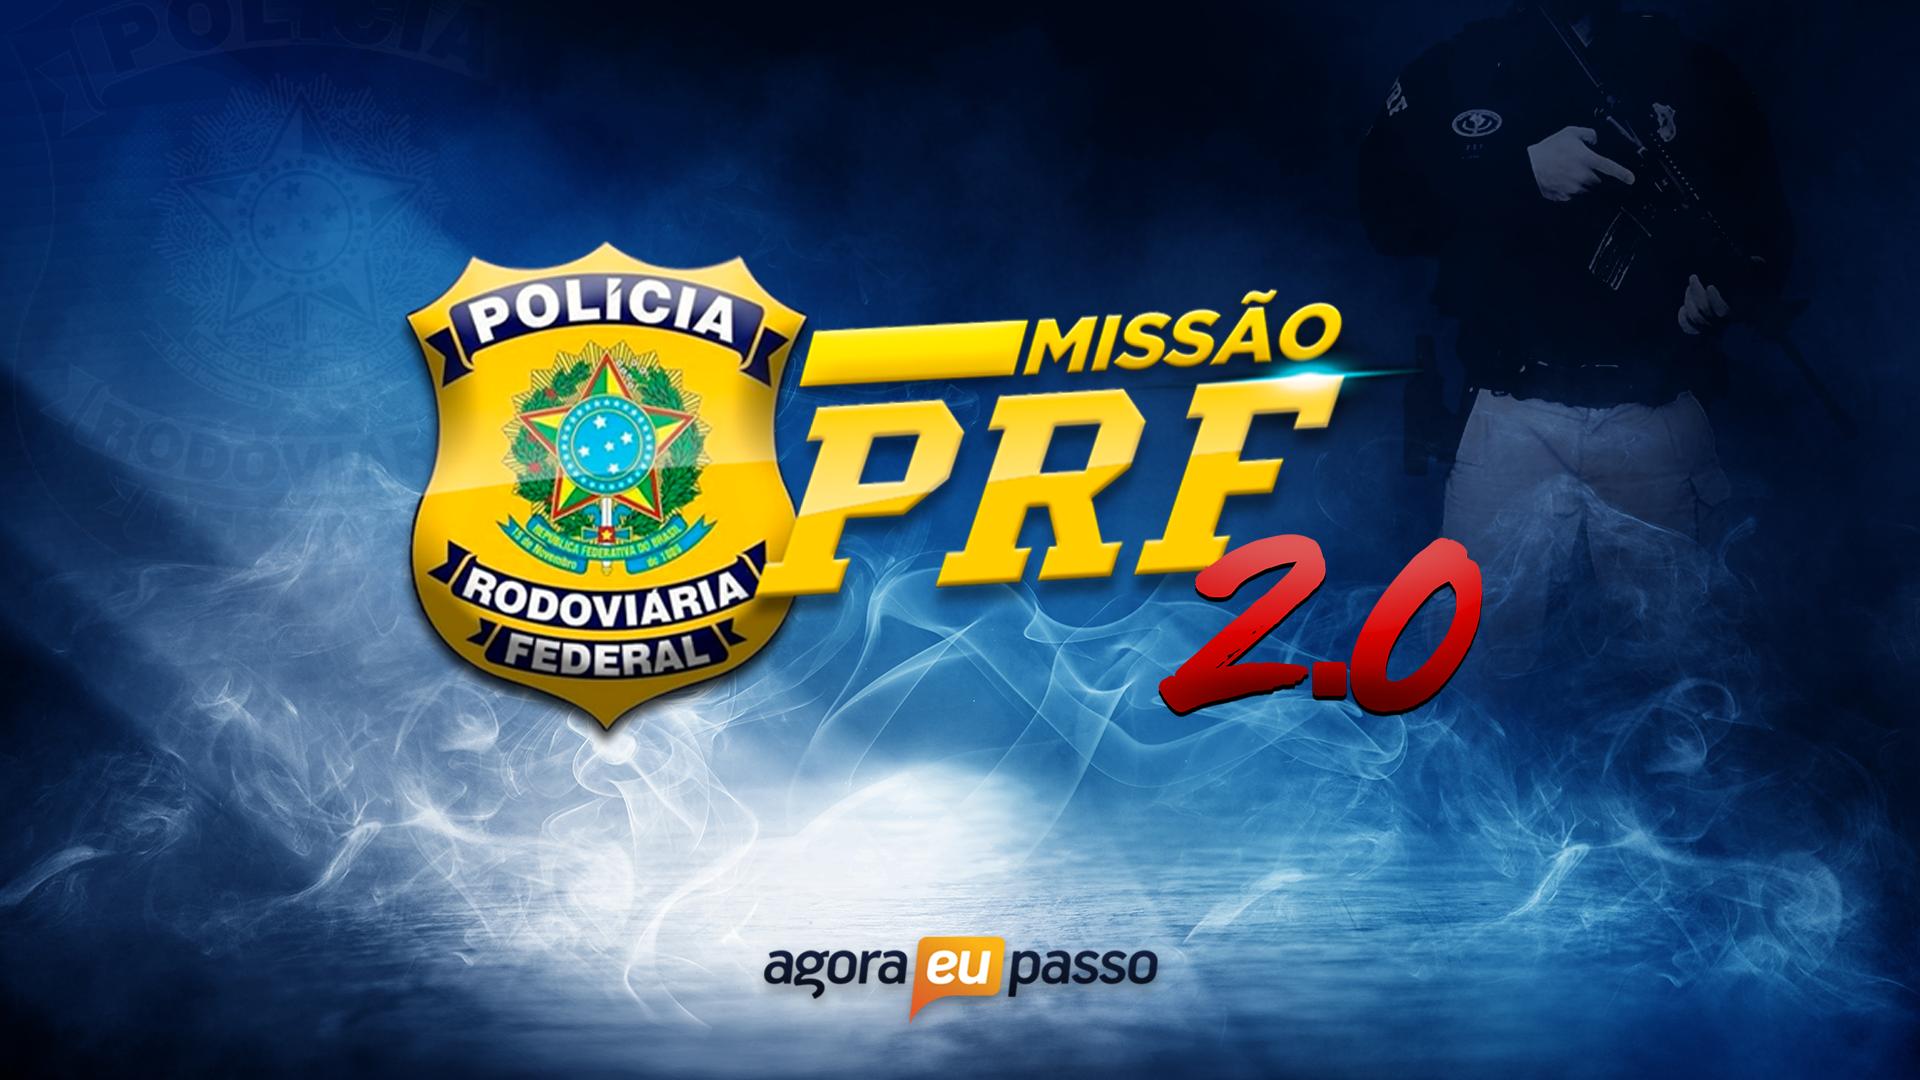 Missão PRF 2.0 - Turma Bravo